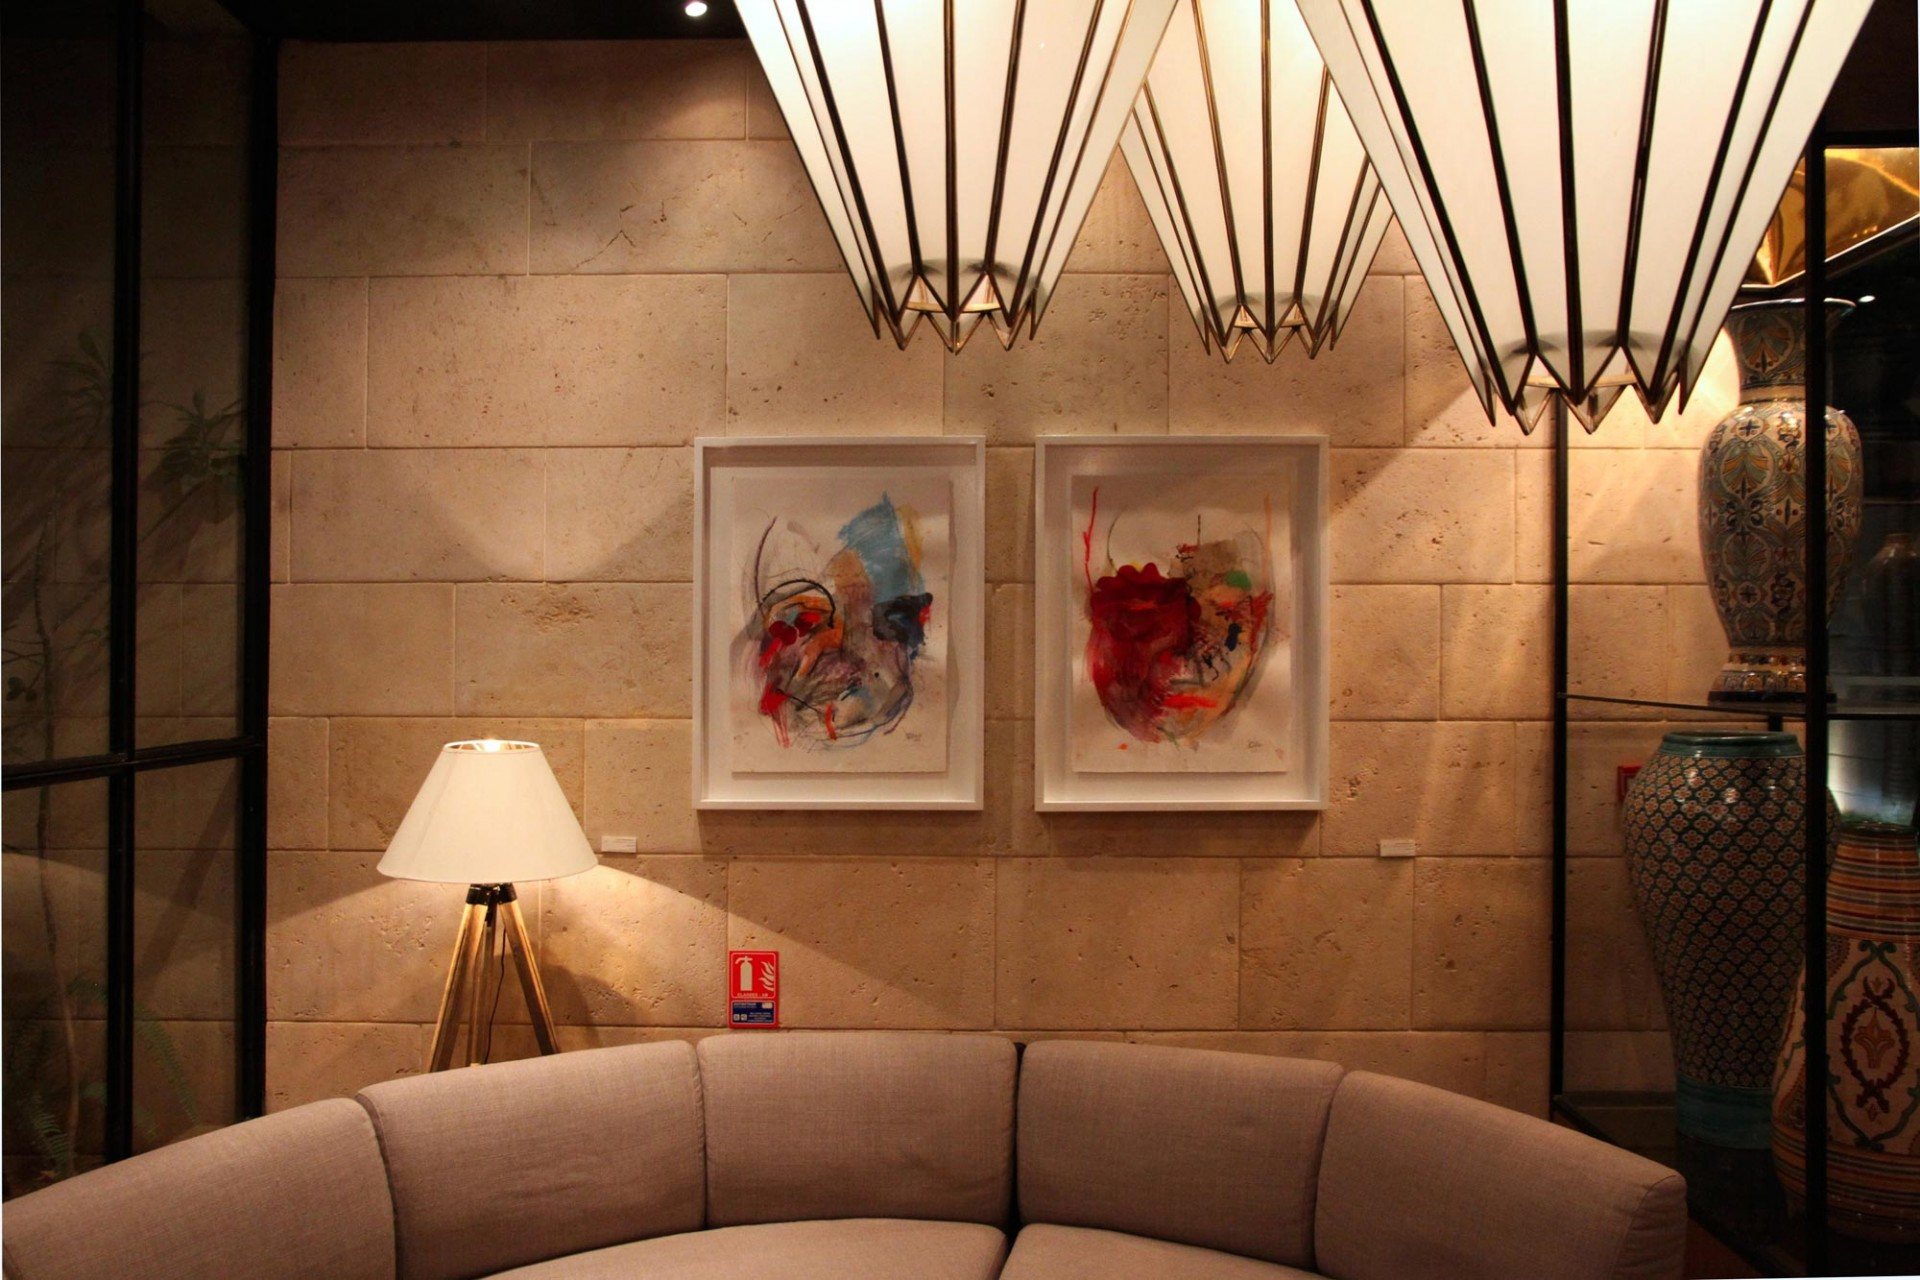 yaze hotel sahrai fez october 3 2015 january 10 2016 david bloch gallery. Black Bedroom Furniture Sets. Home Design Ideas